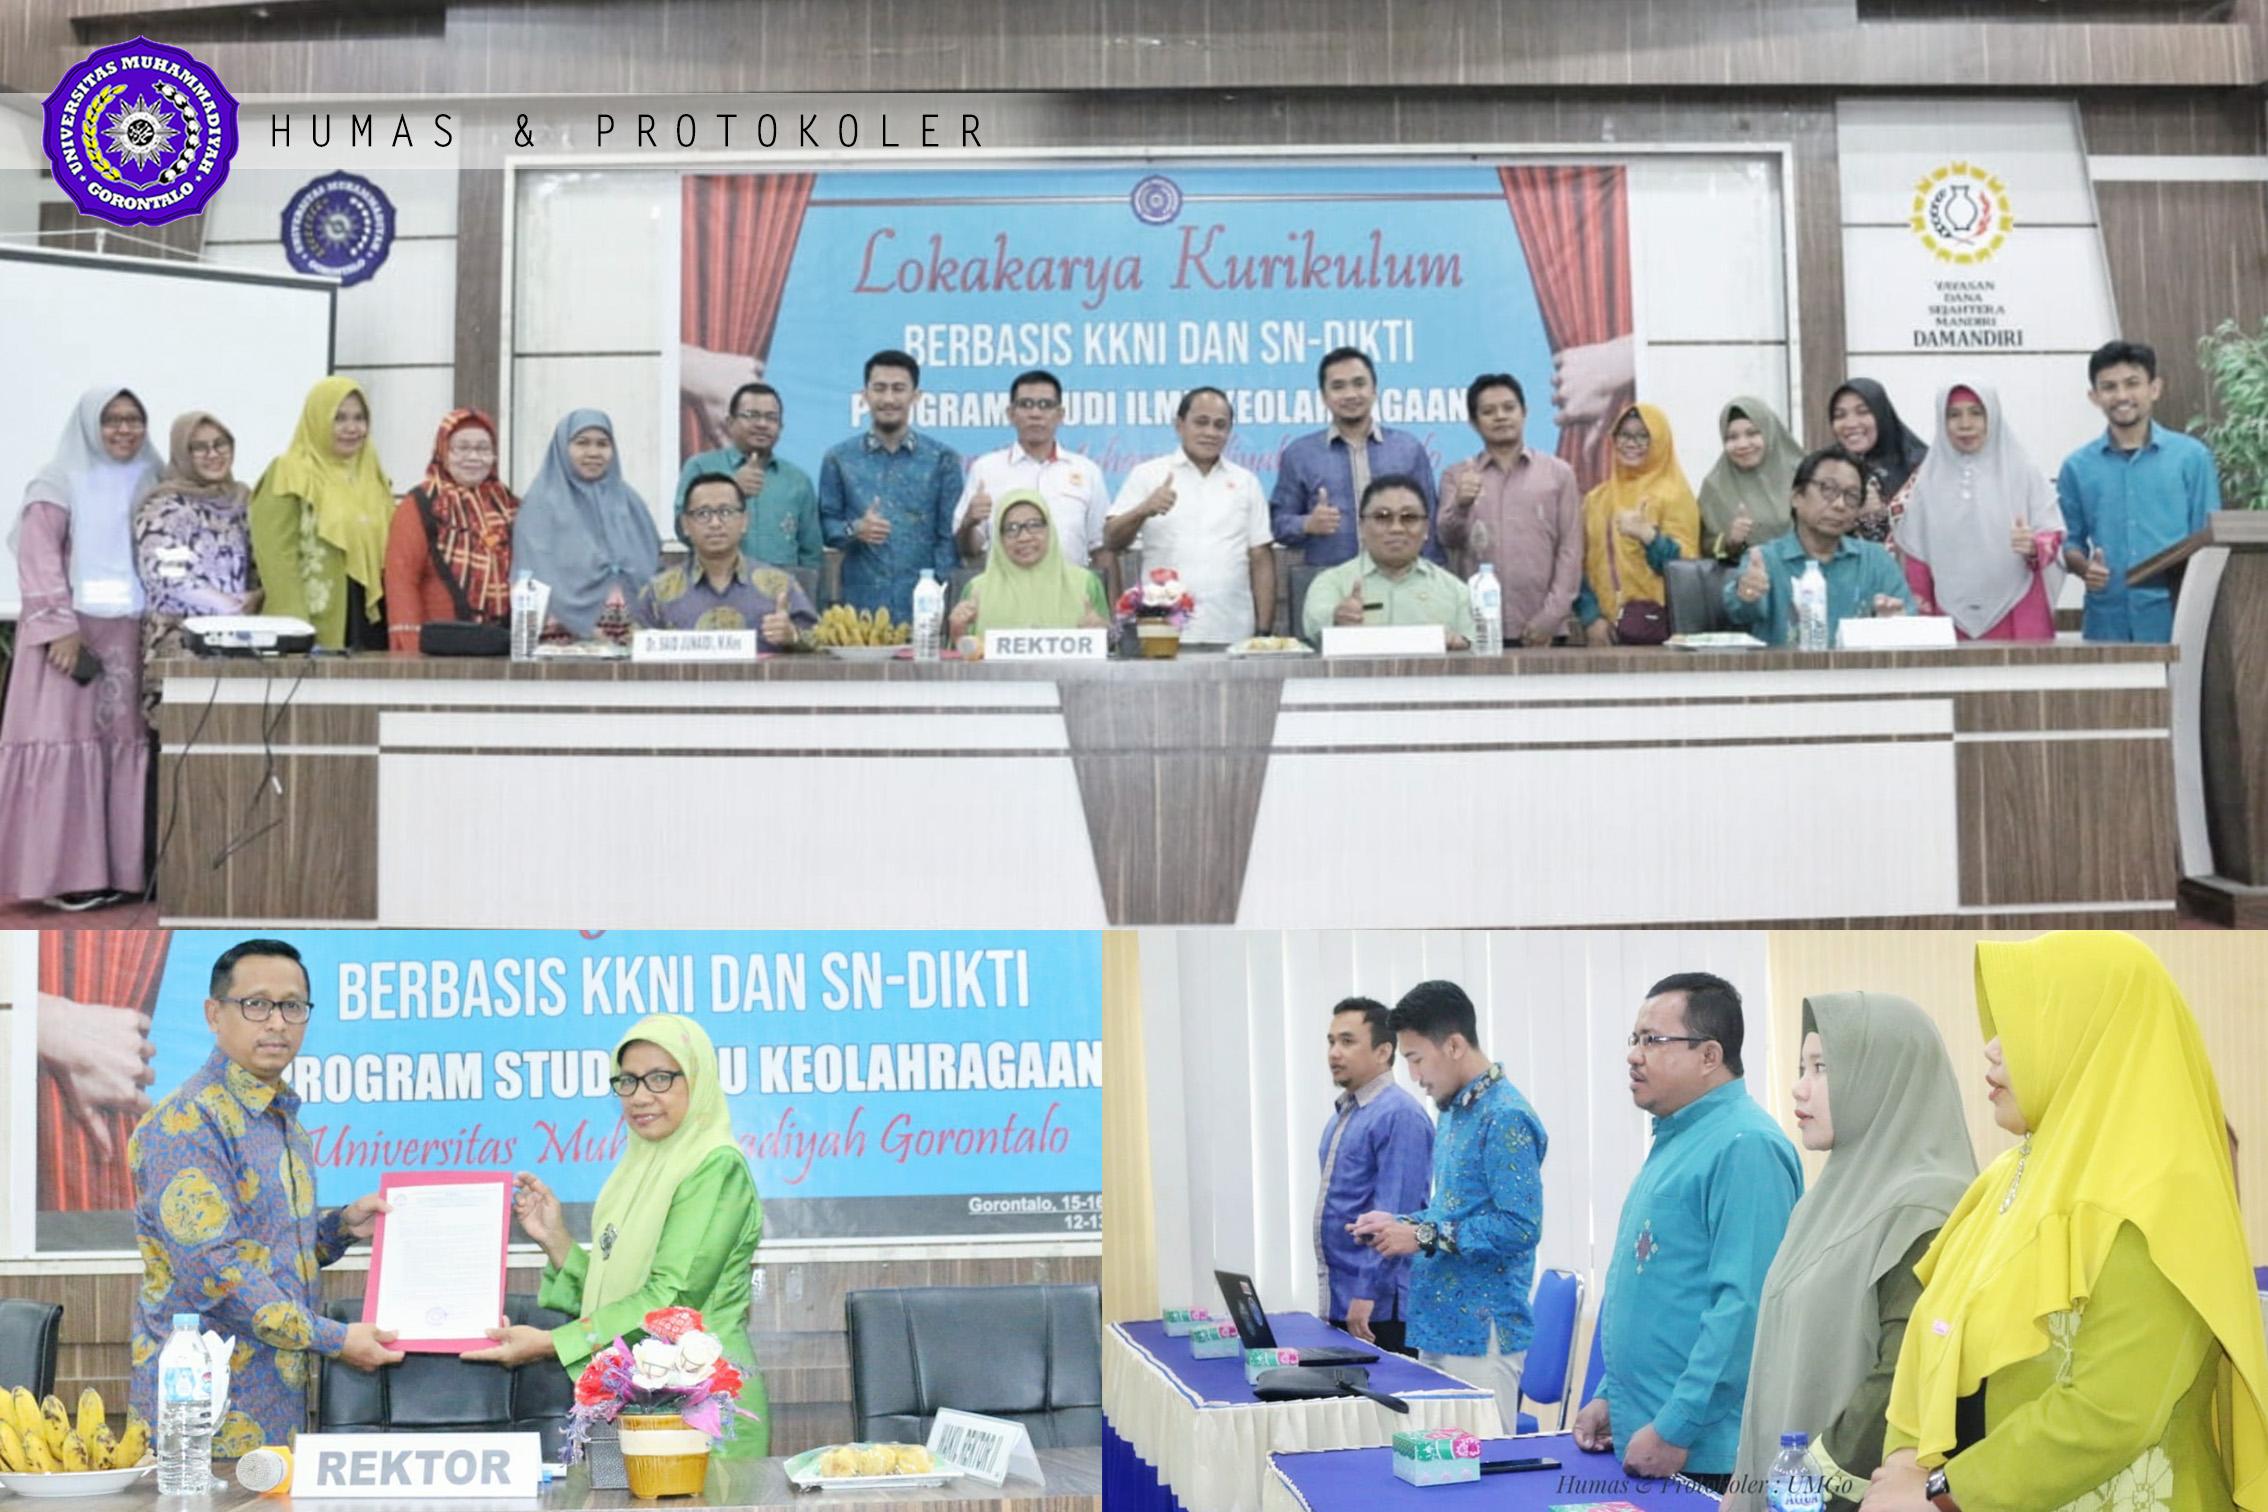 Lokakarya Kurikulum Berbasis KKNI-SN, Menuju Prodi Ilmu Keolahragaan